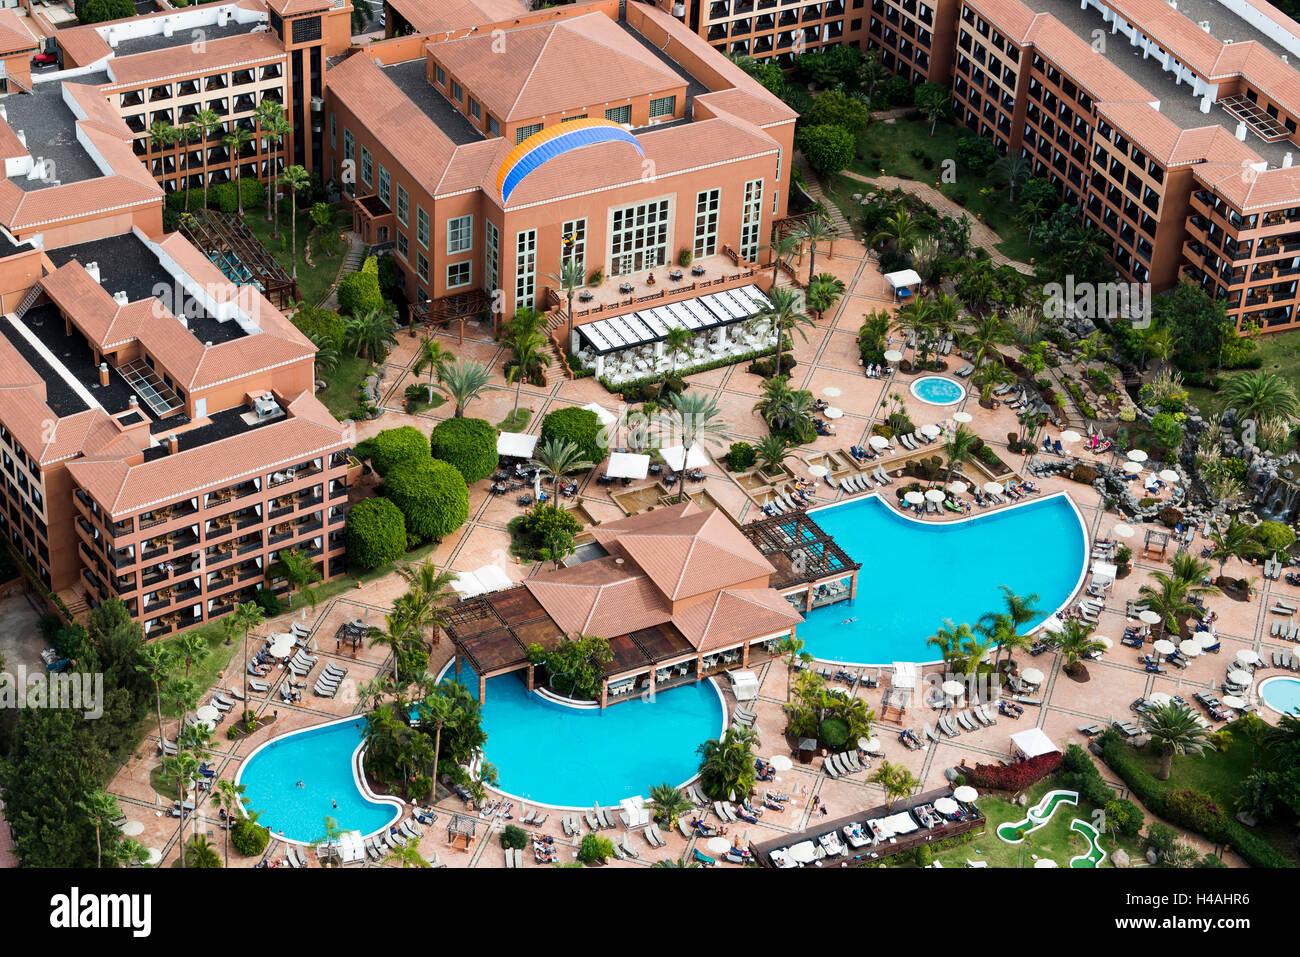 Swimming pools aerial stock photos swimming pools aerial - Public swimming pools north las vegas ...